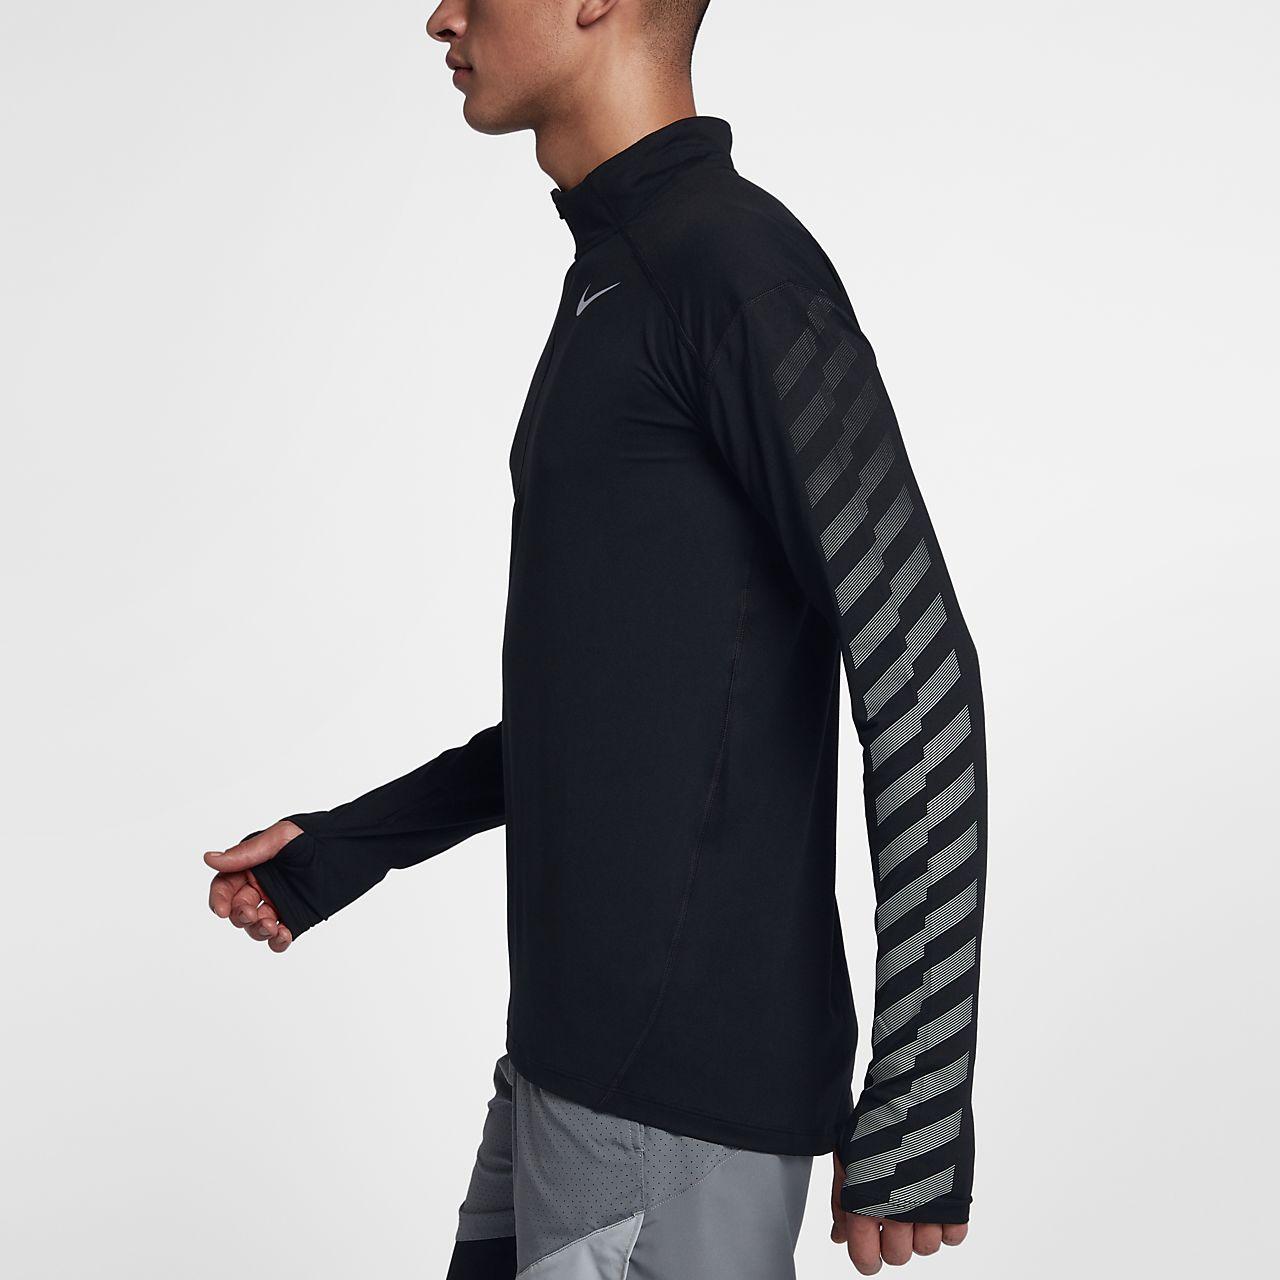 Nike Flash Men's Long Sleeve Running Top